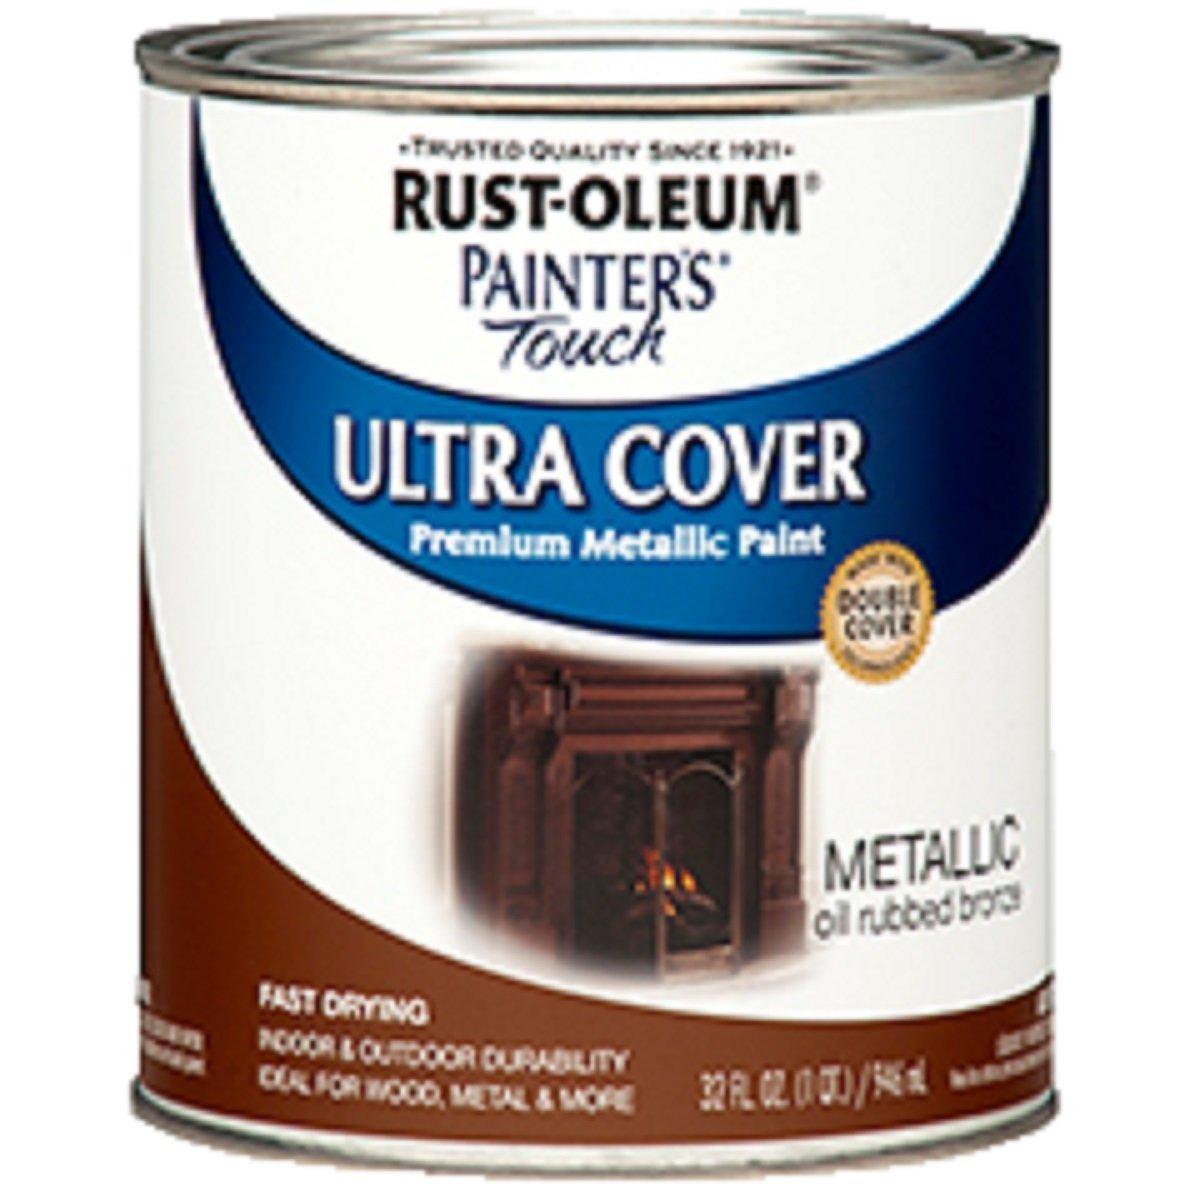 Rust-Oleum 254101 Painters Touch Quart Oil Based, Metallic Oil-Rubbed Bronze